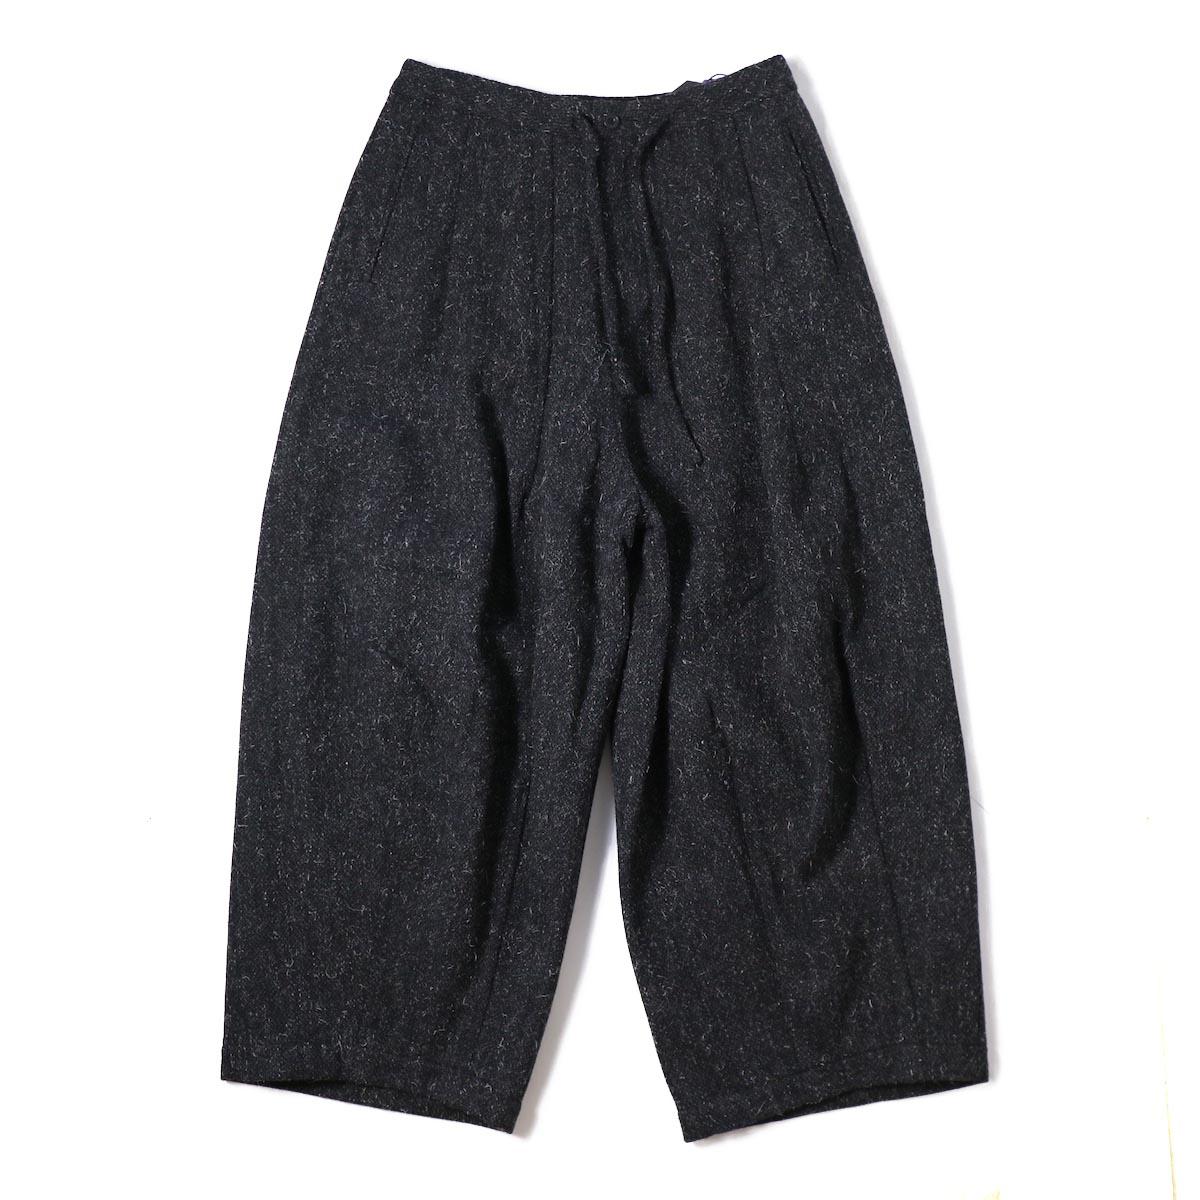 NEEDLES (WOMENS) / Darts Military Pant W/Pe/A/N Tweed -CHARCOAL